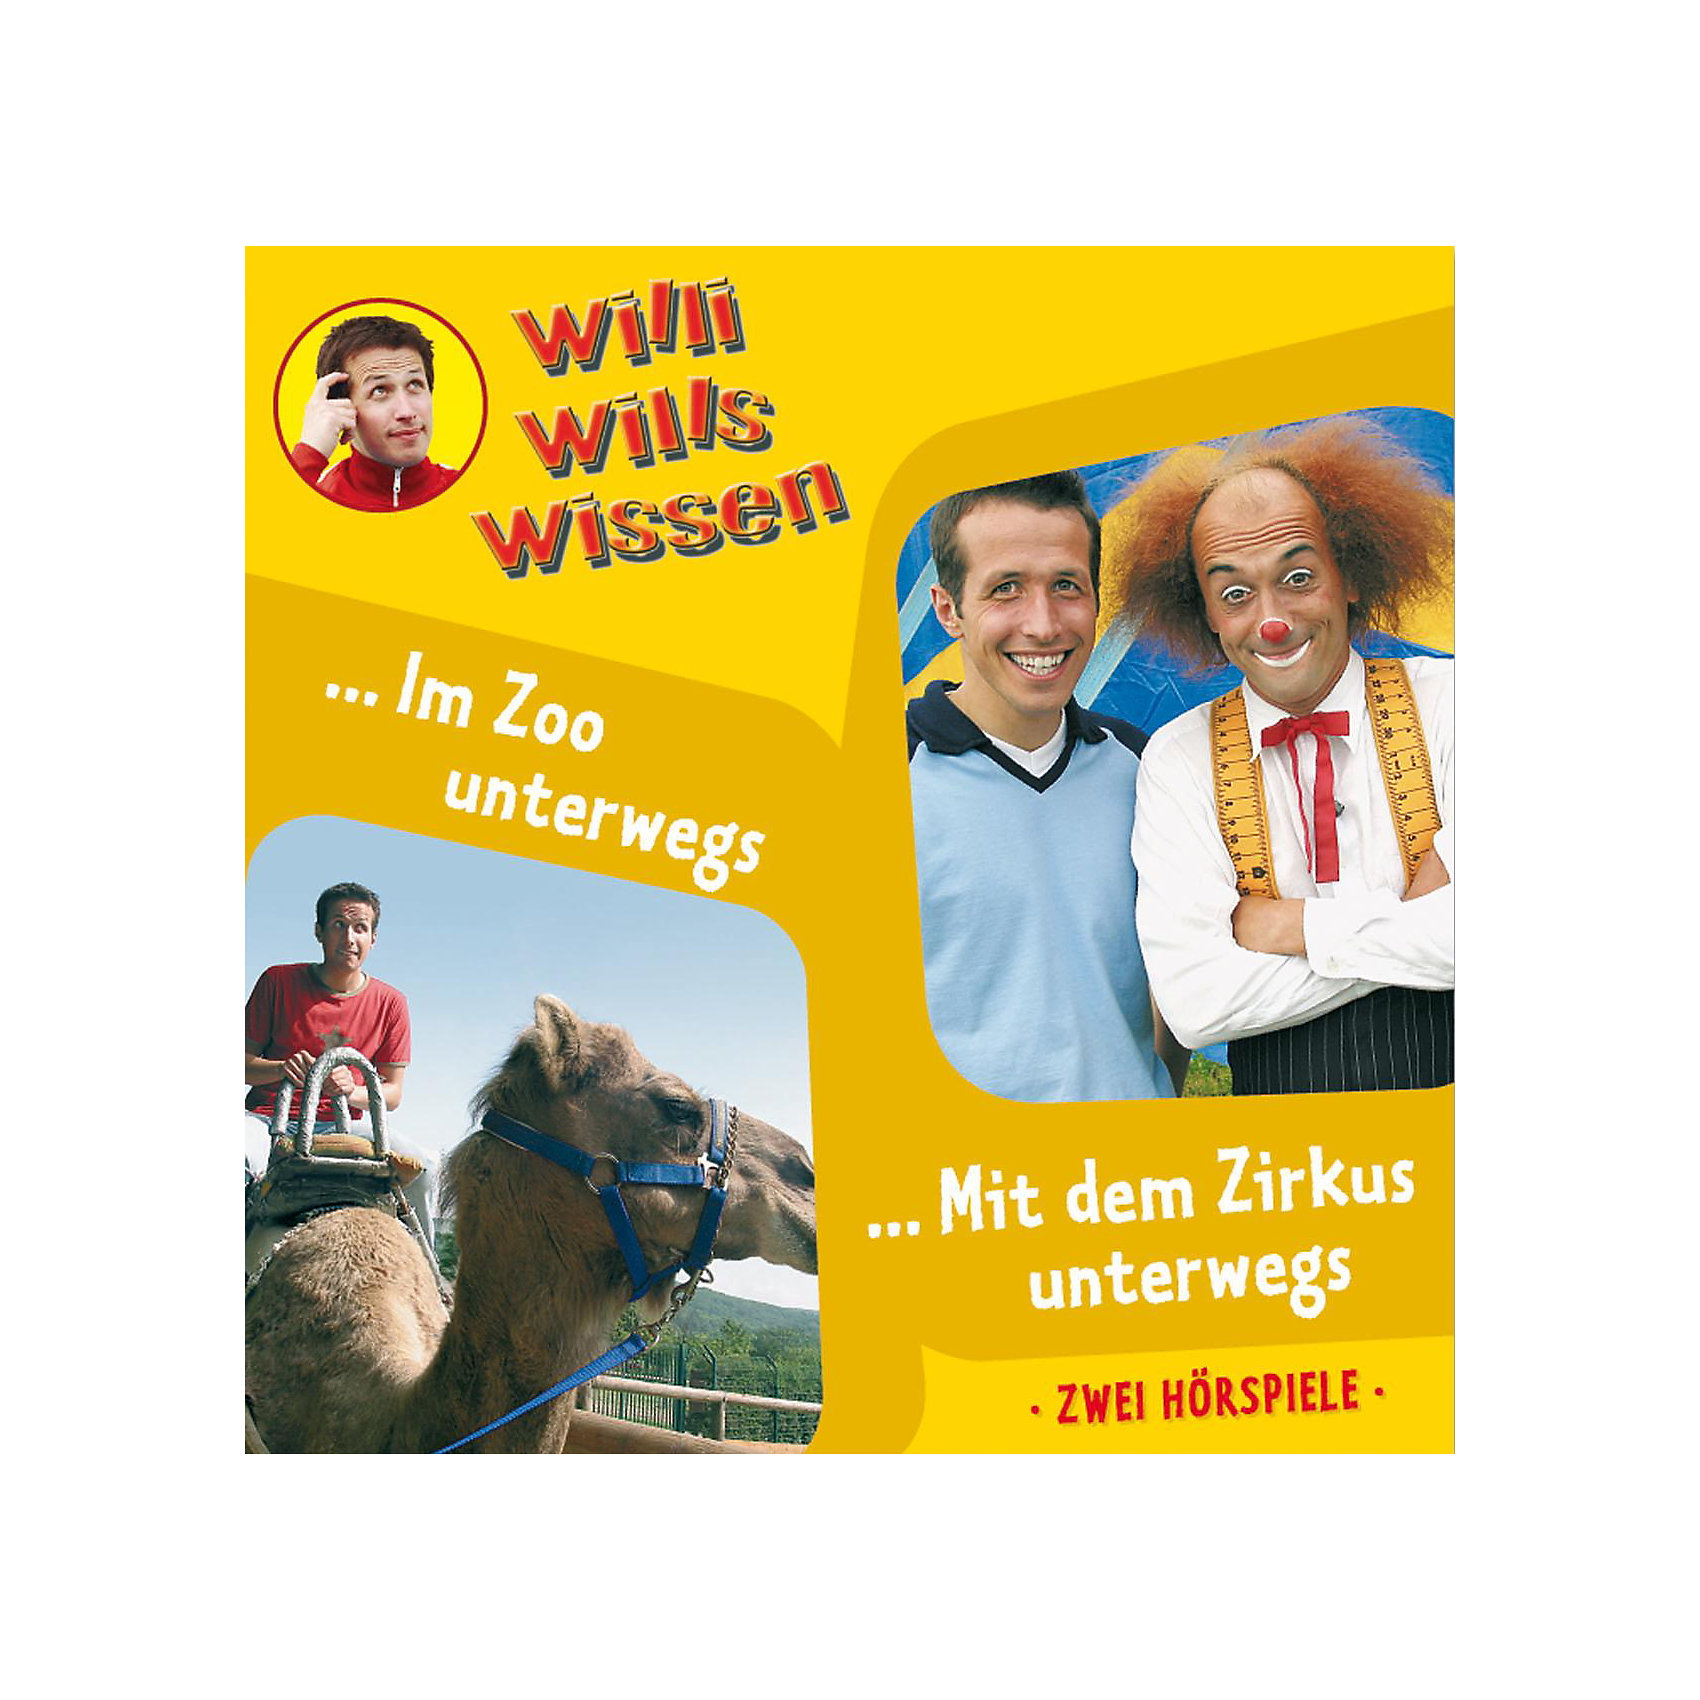 CD Willi wills wissen 05: In Zoo unterwegs/ Mit dem Zirkus unterwegs